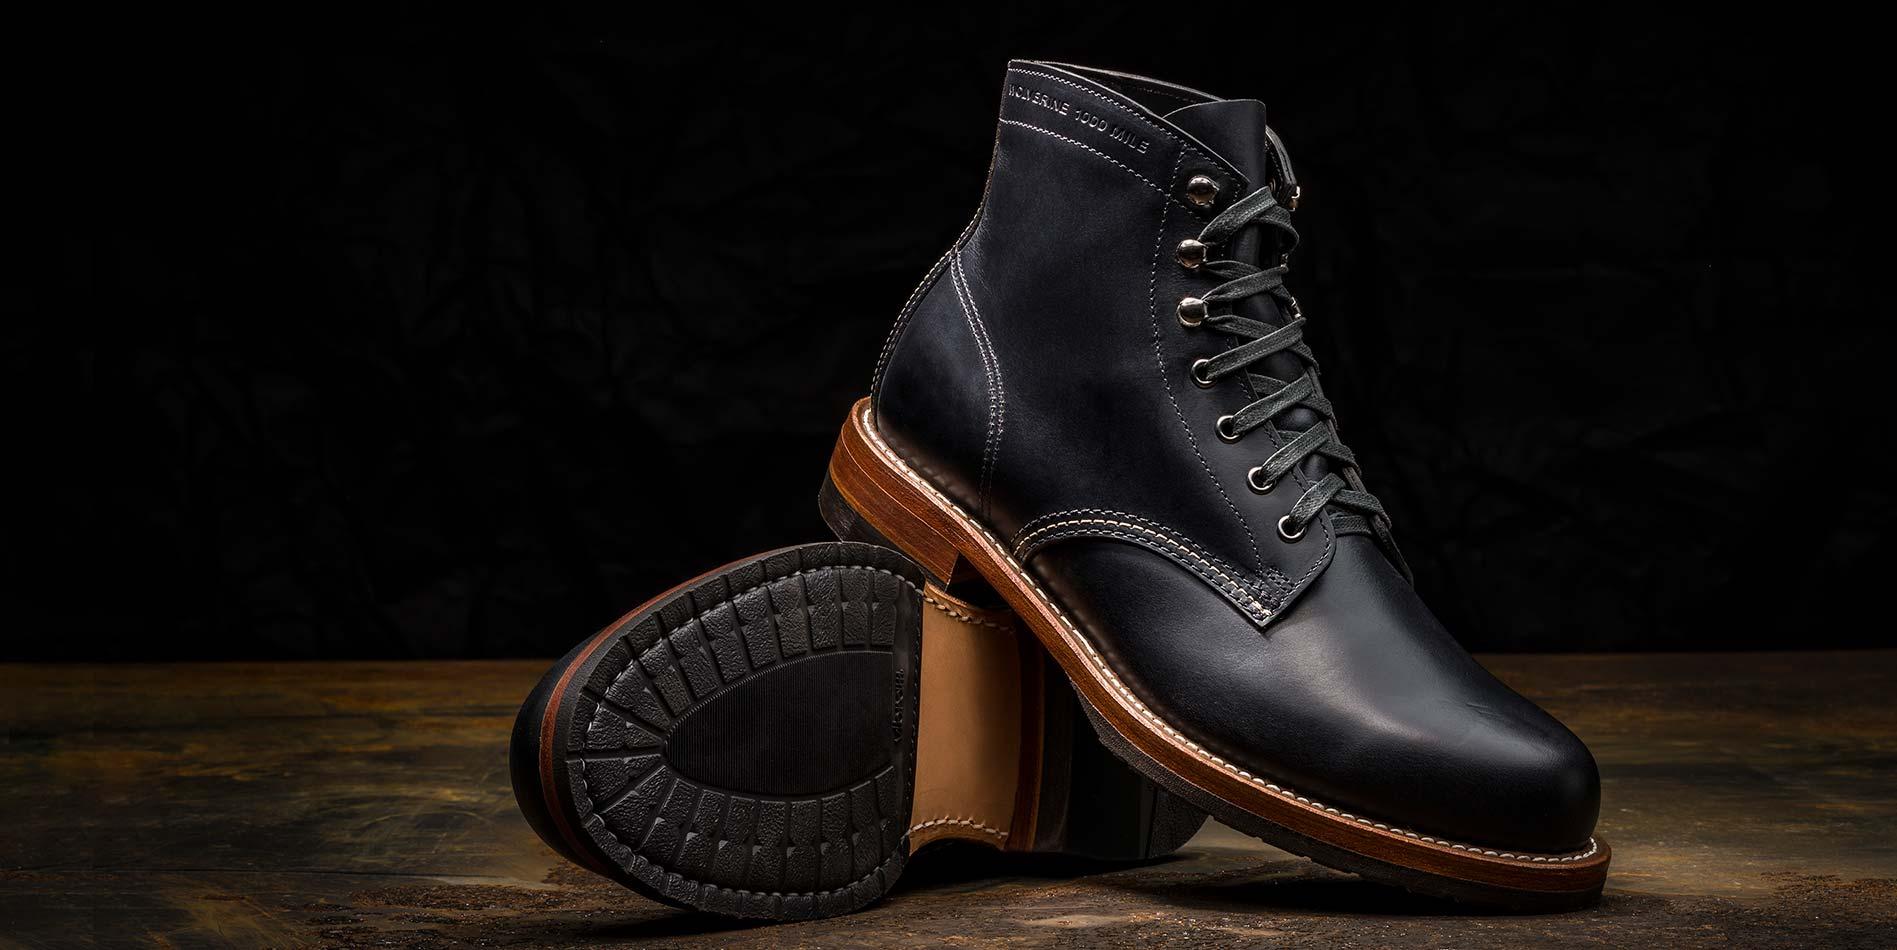 Wolverine 1000 Mile 1883 Vintage Boots D Island Shoes Slip On Mocasine Casual Brown The Evans Boot